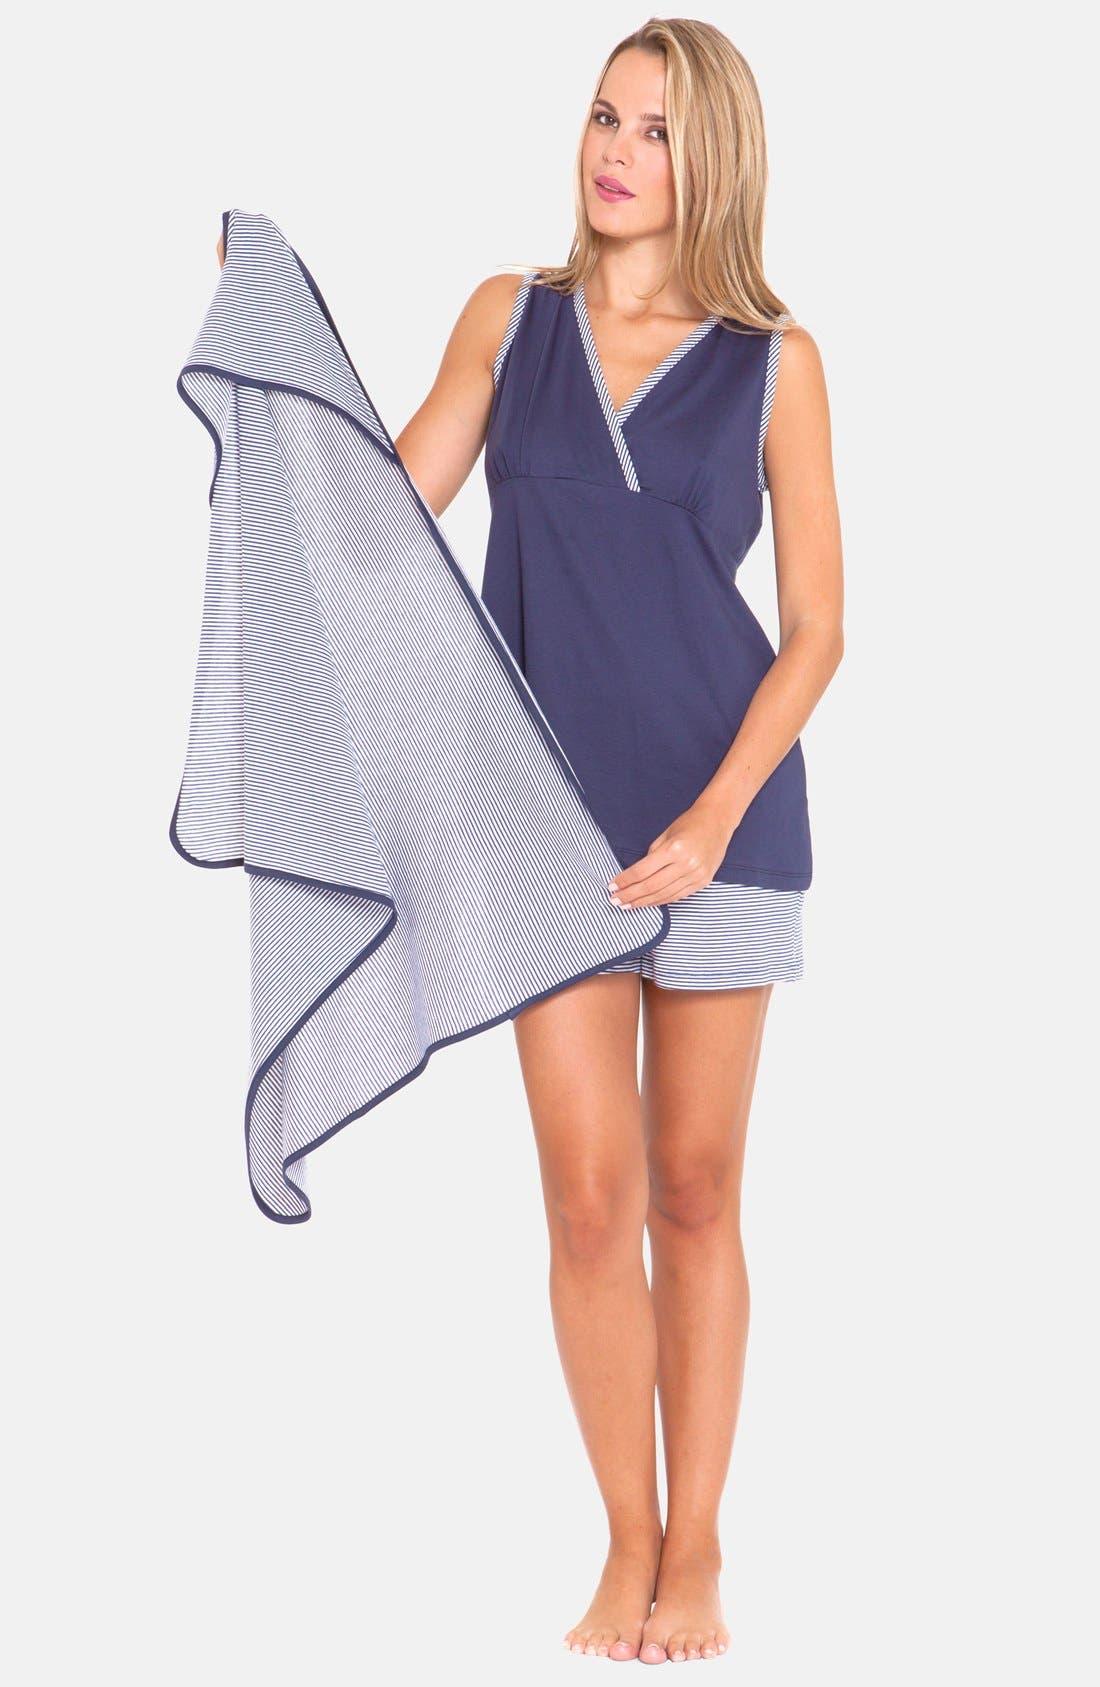 Alternate Image 1 Selected - Olian 3-Piece Maternity Sleepwear Gift Set